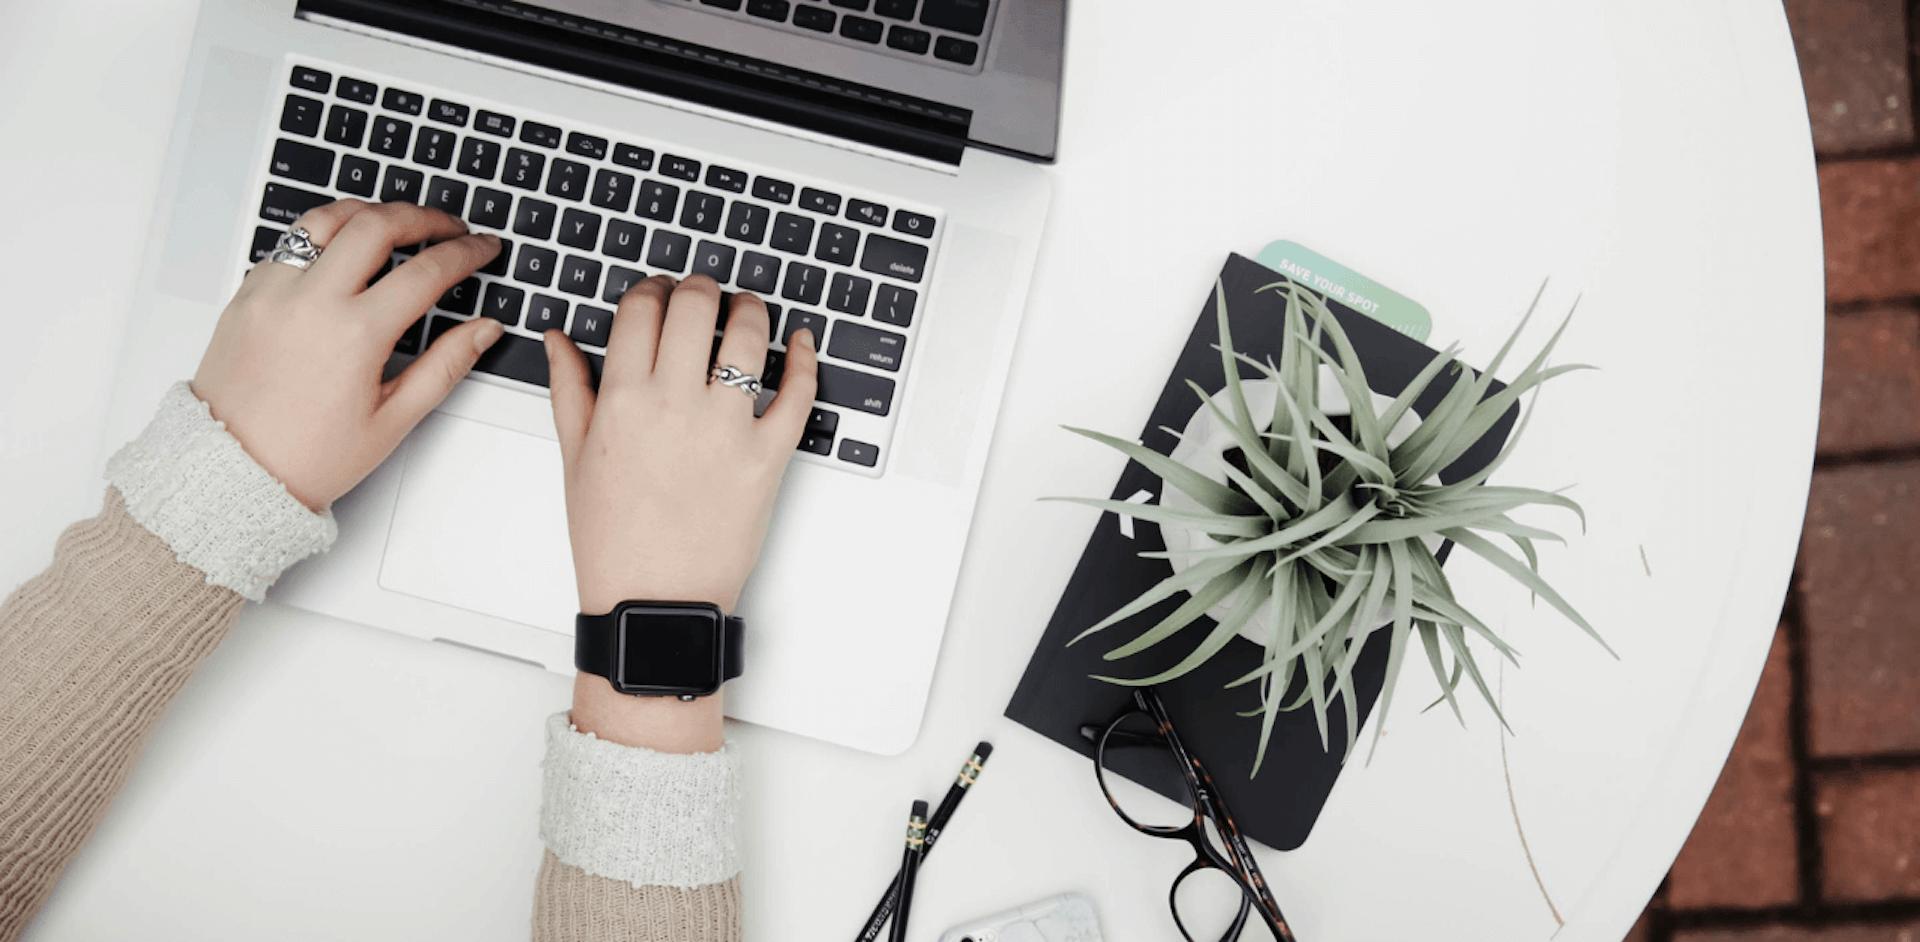 Consejos para mantenerte actualizado en tu carrera profesional